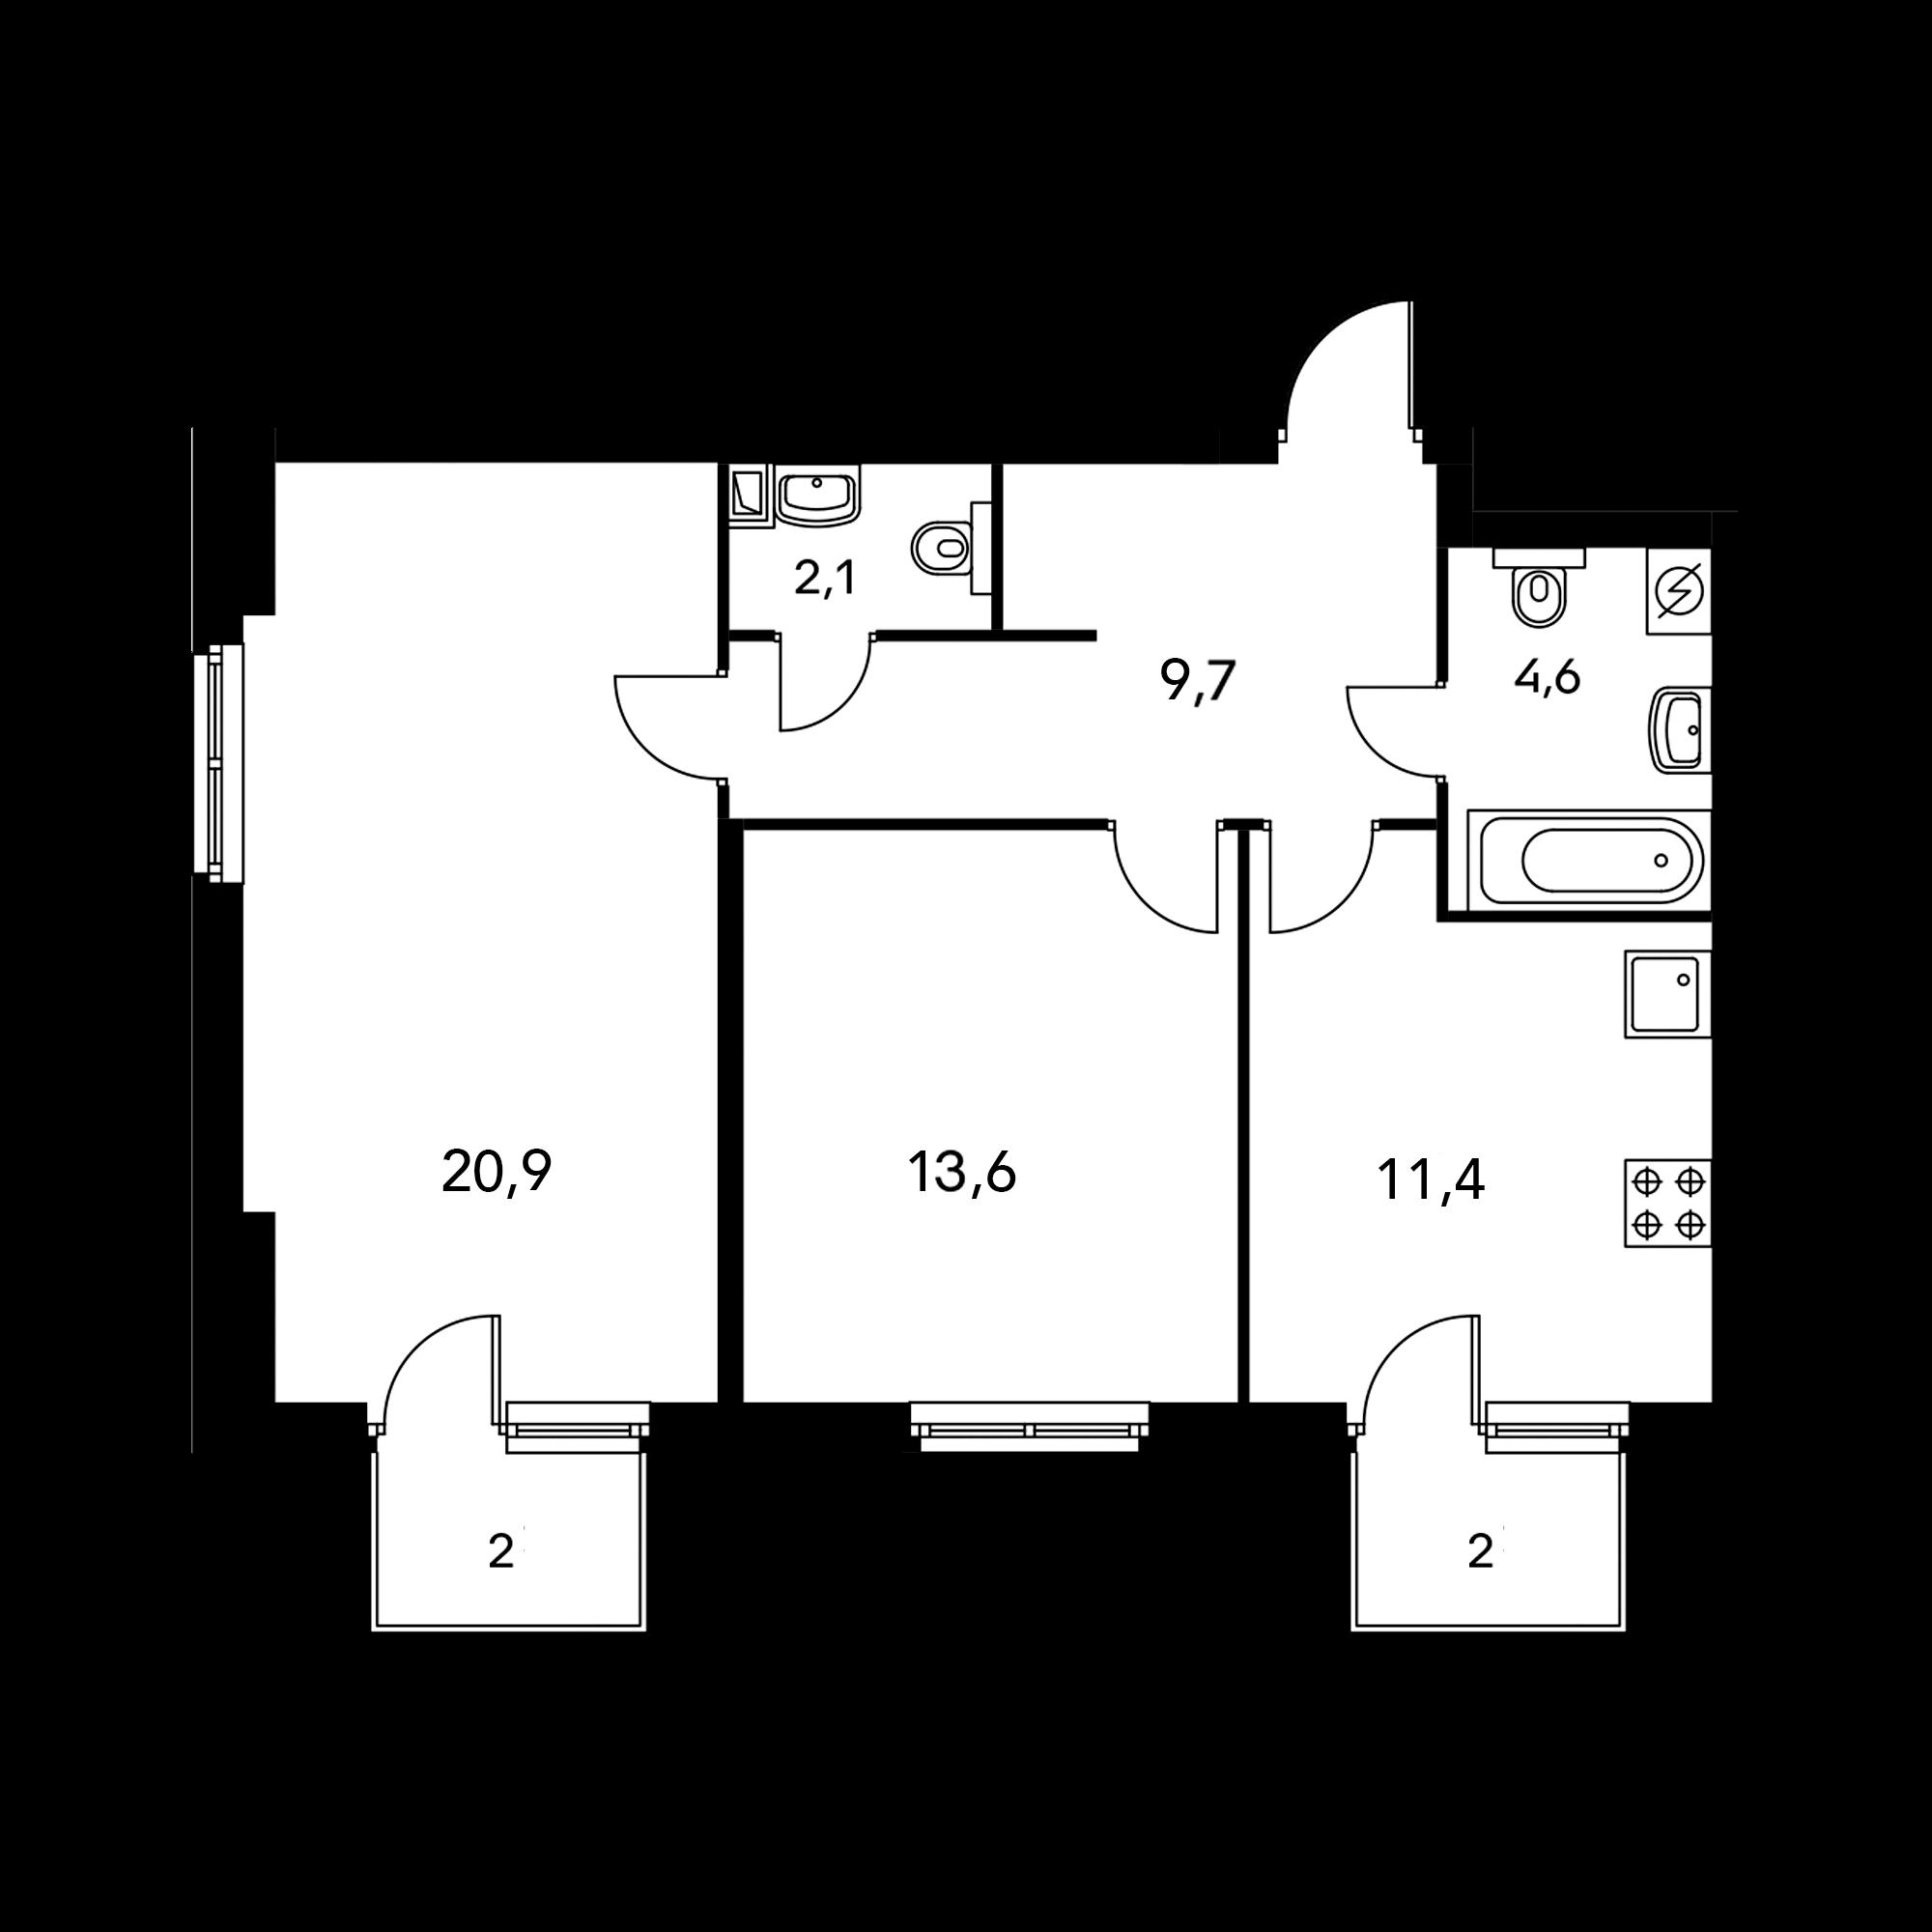 2KM6_10.2-B4